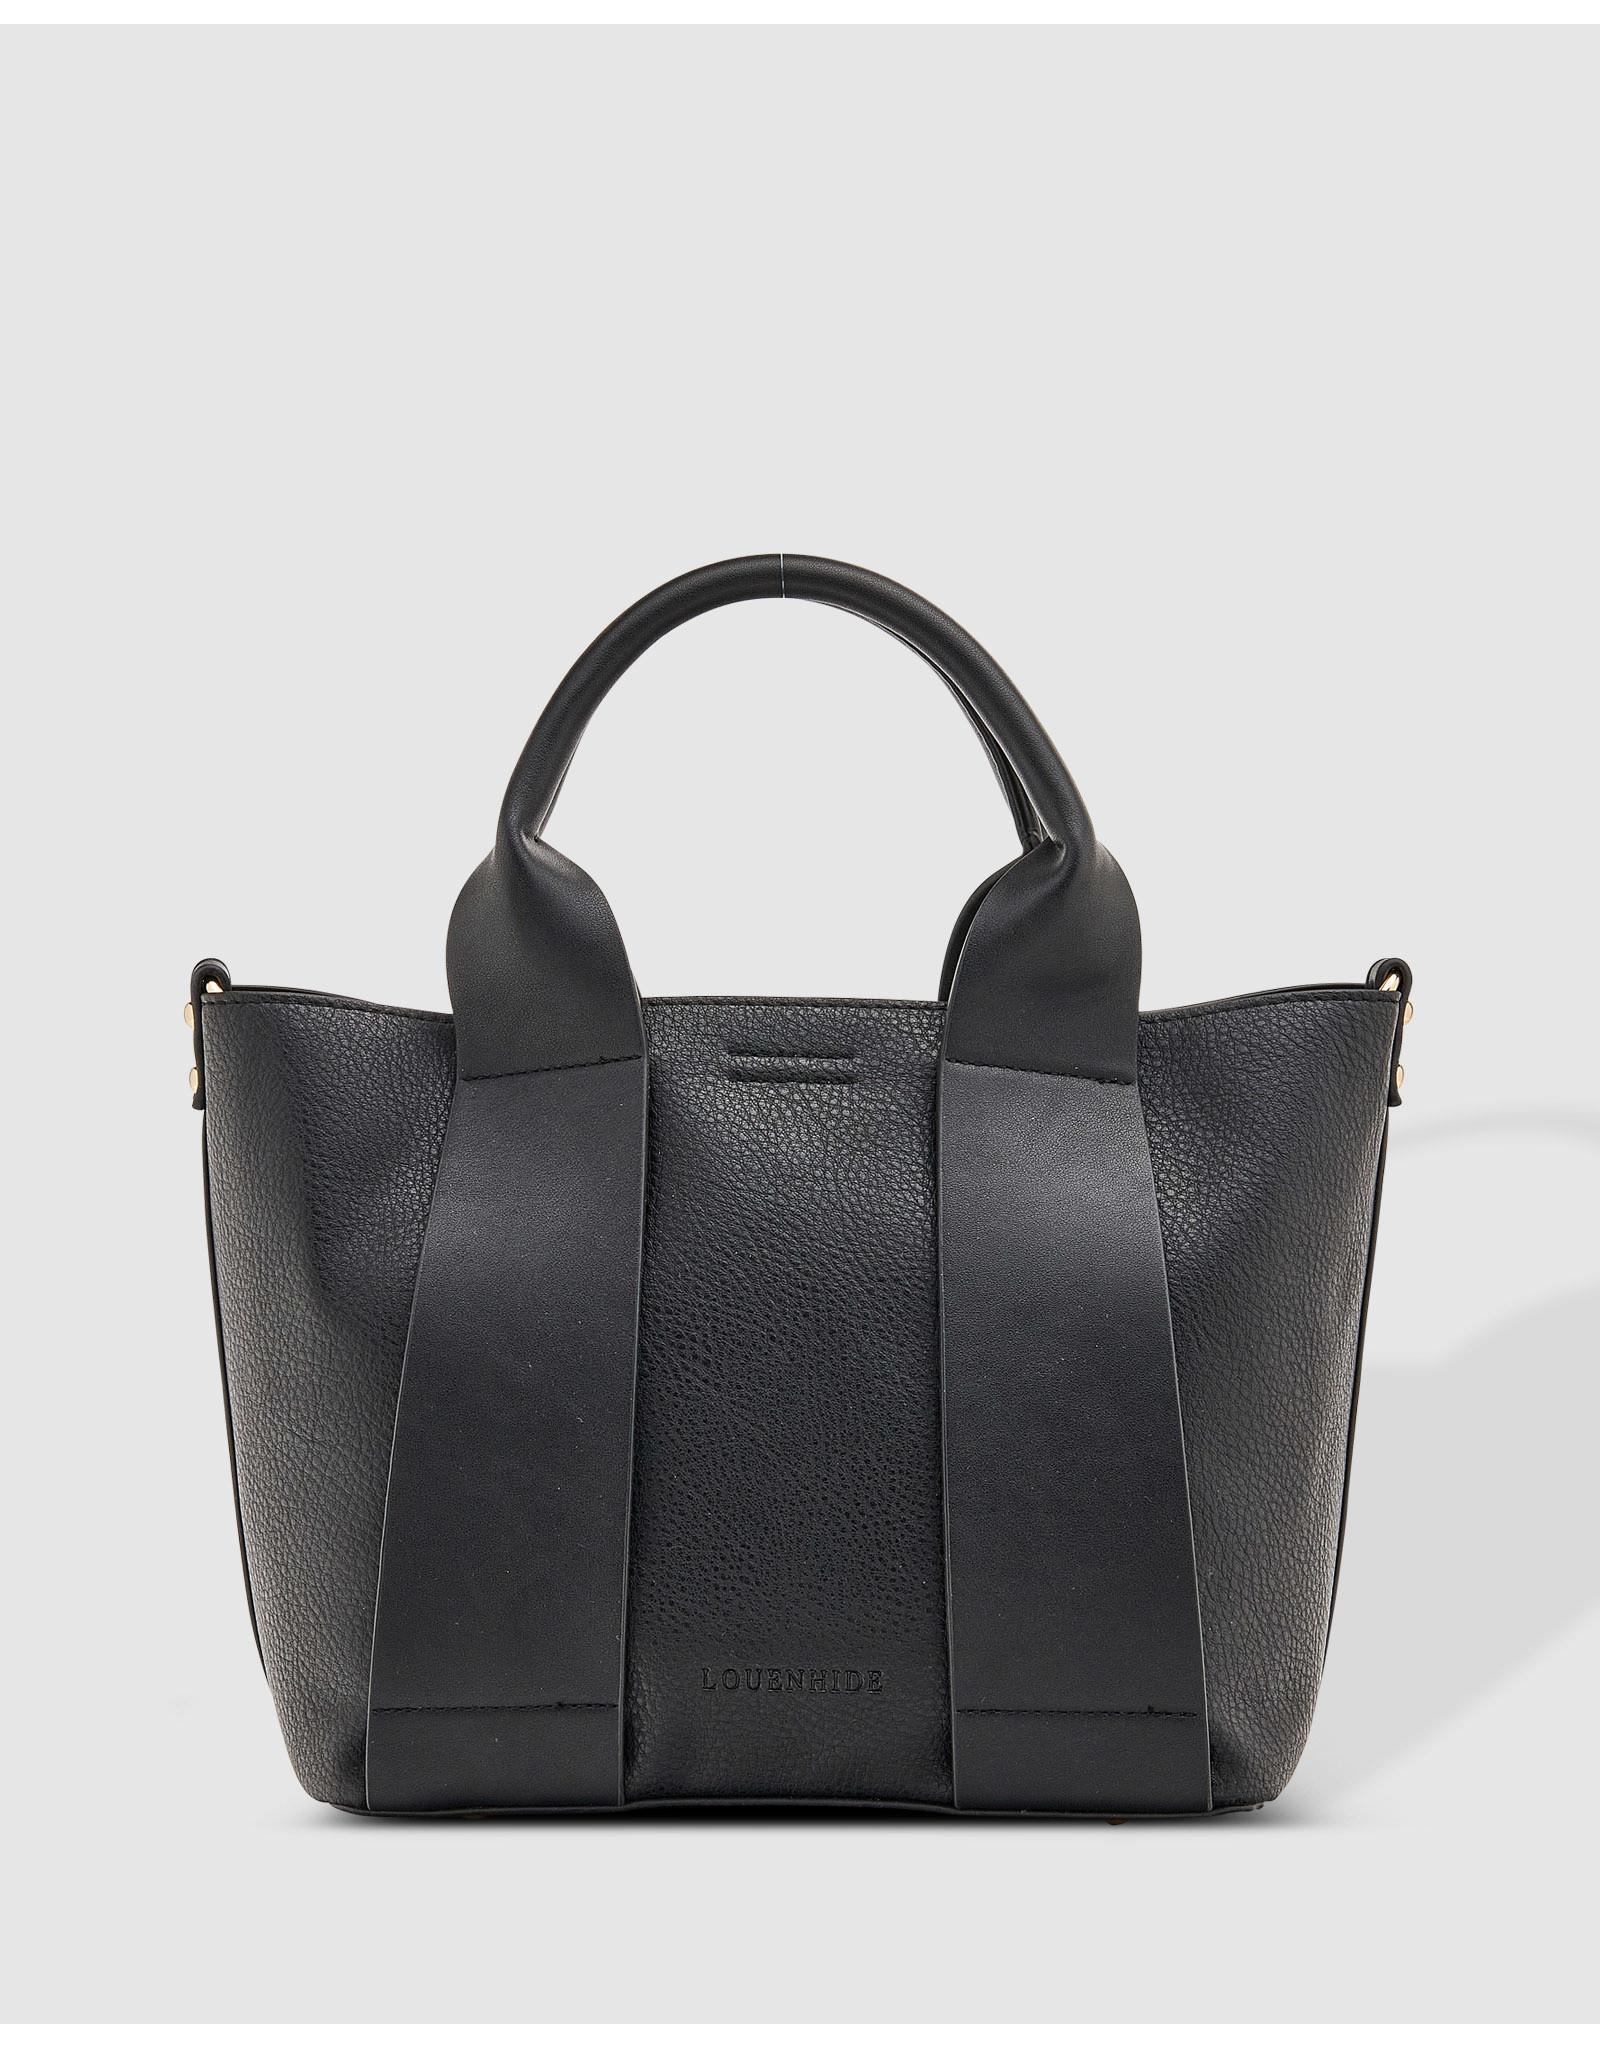 Louenhide Louenhide Windsor Bag